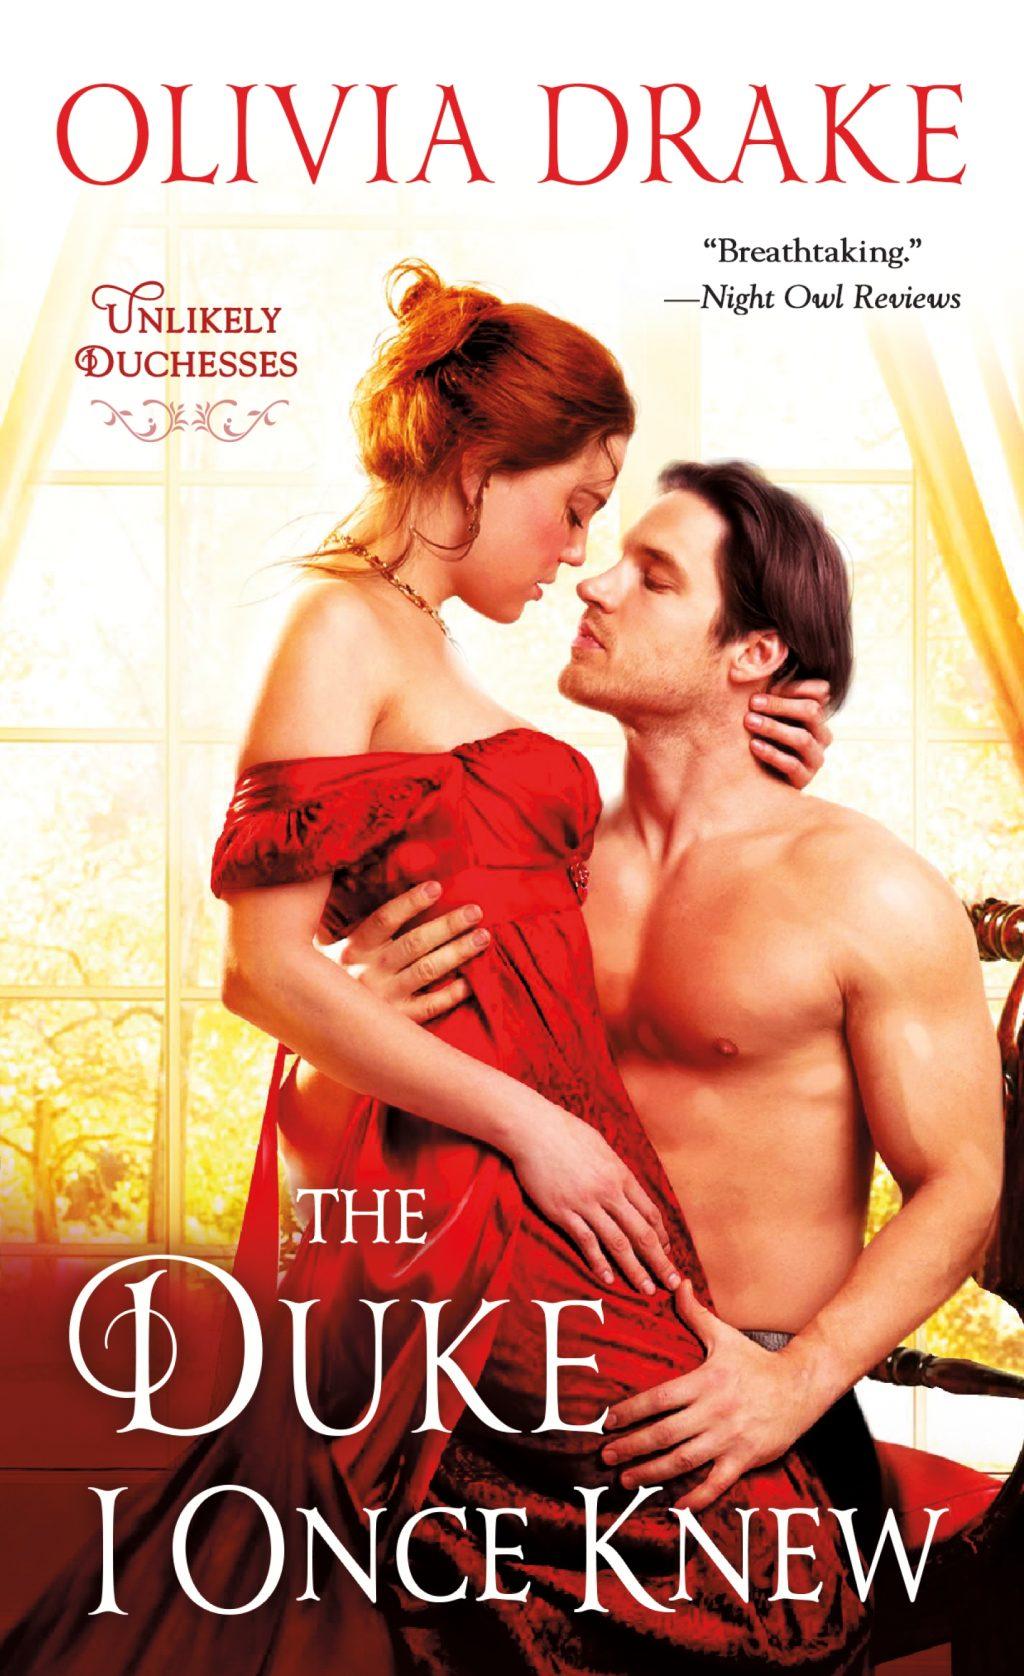 The Duke I Once Knew by Olivia Drake